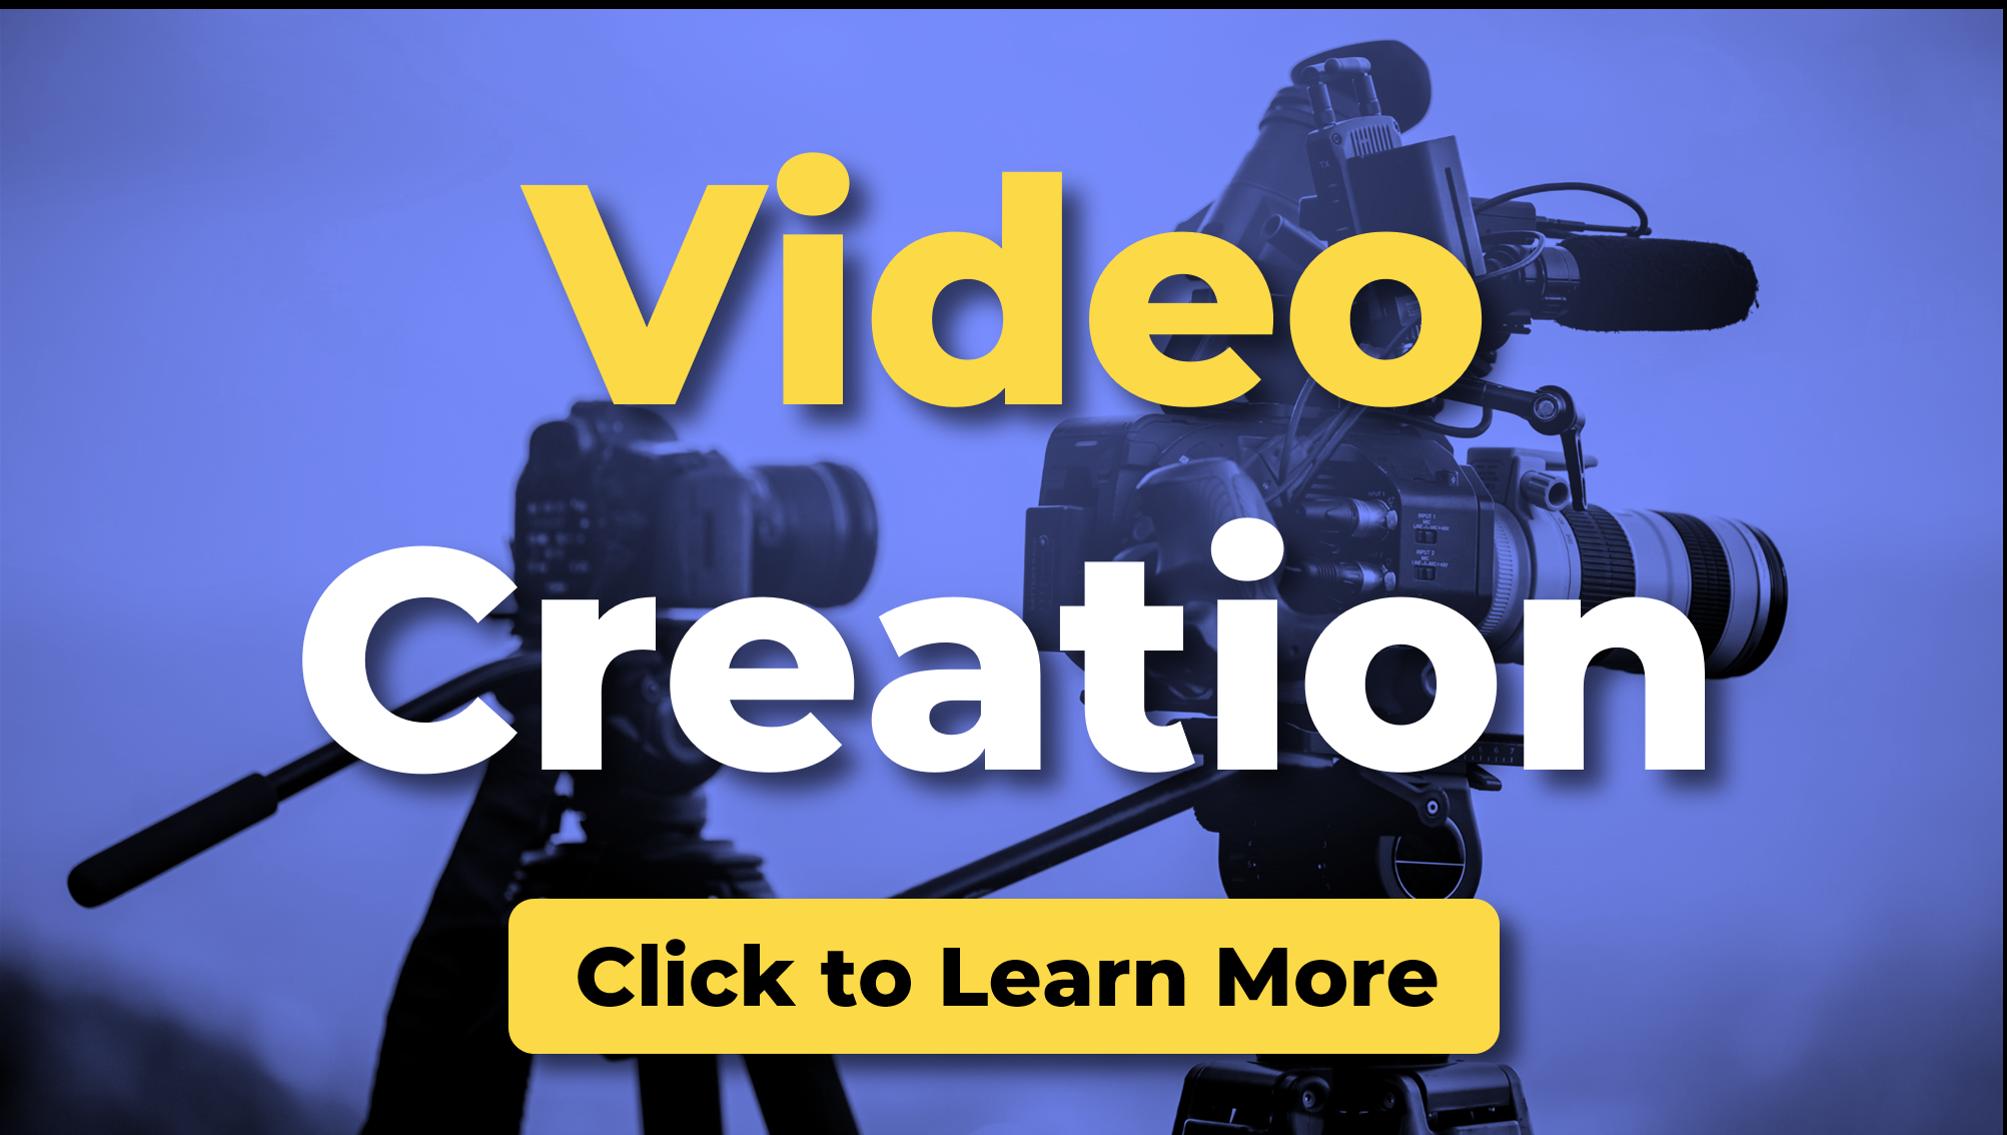 Affordable Videos - www.visualbreakthroughs.com